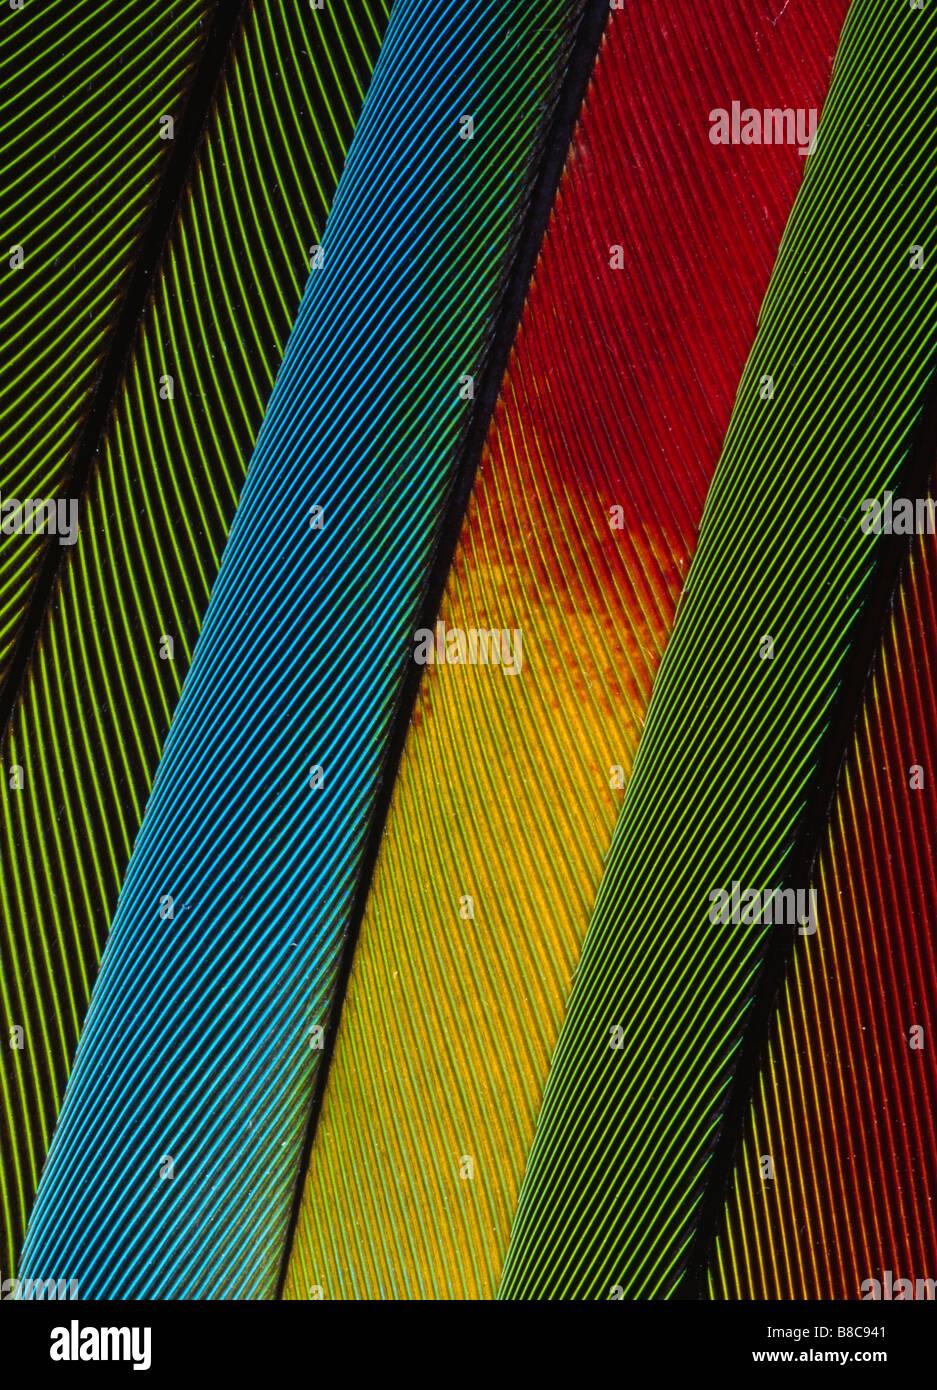 PENAS DE PAPAGAIO Imagens de Stock